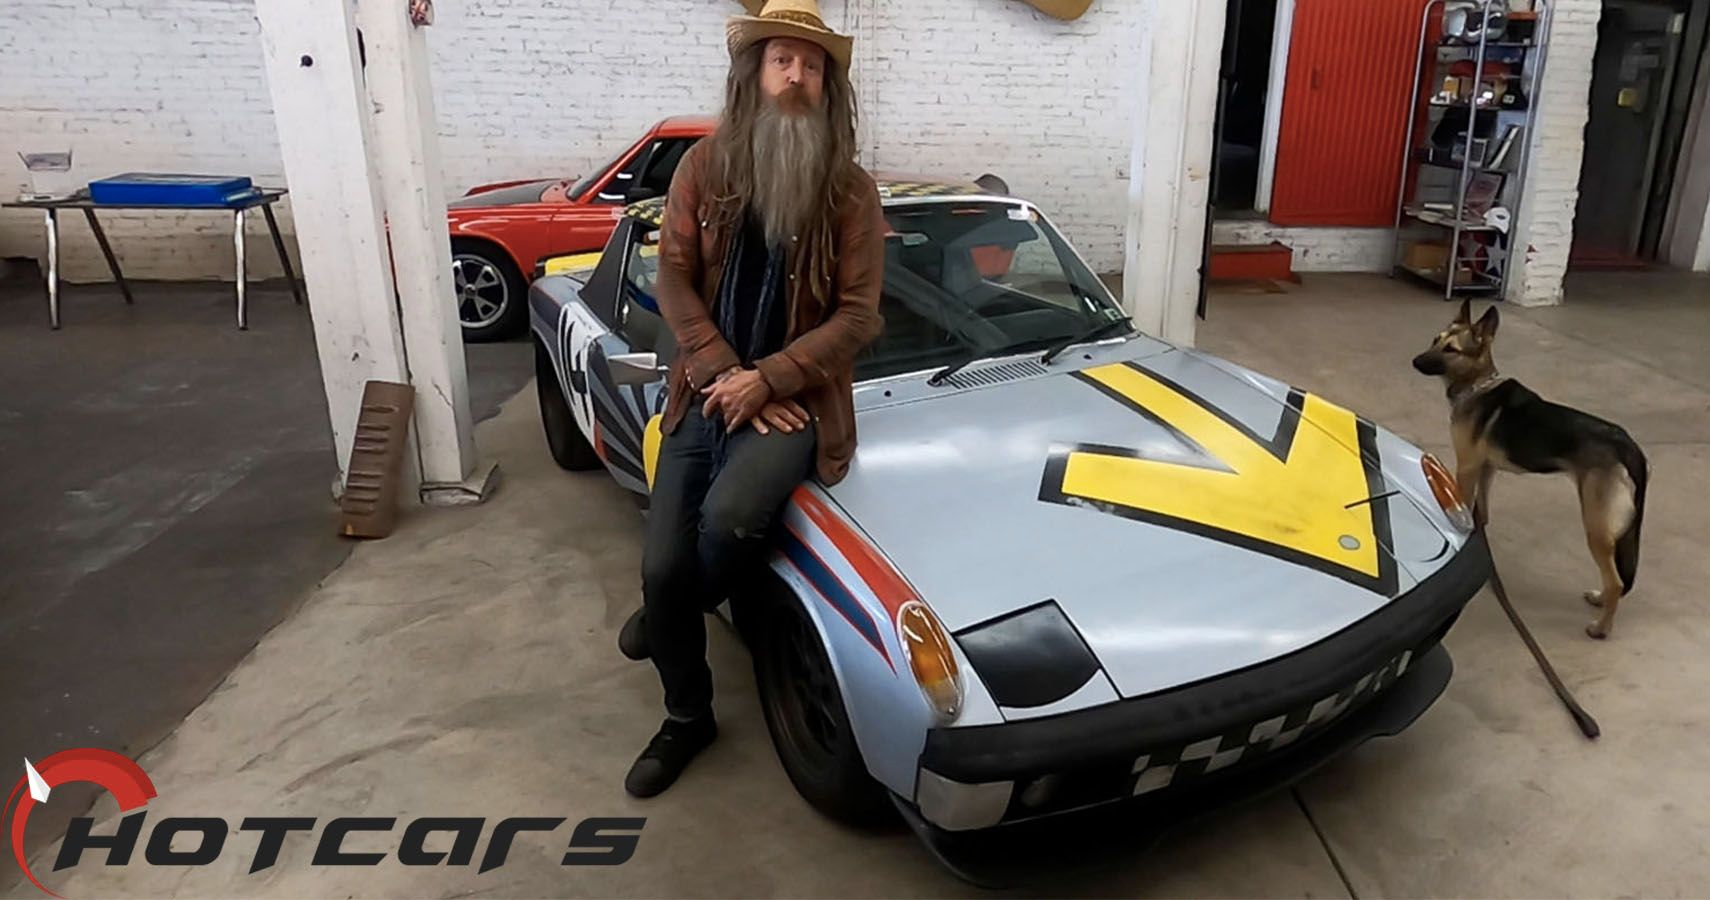 EXCLUSIVE: HotCars.com Checks Out Magnus Walker's Porsche 914 SEMA Art Car